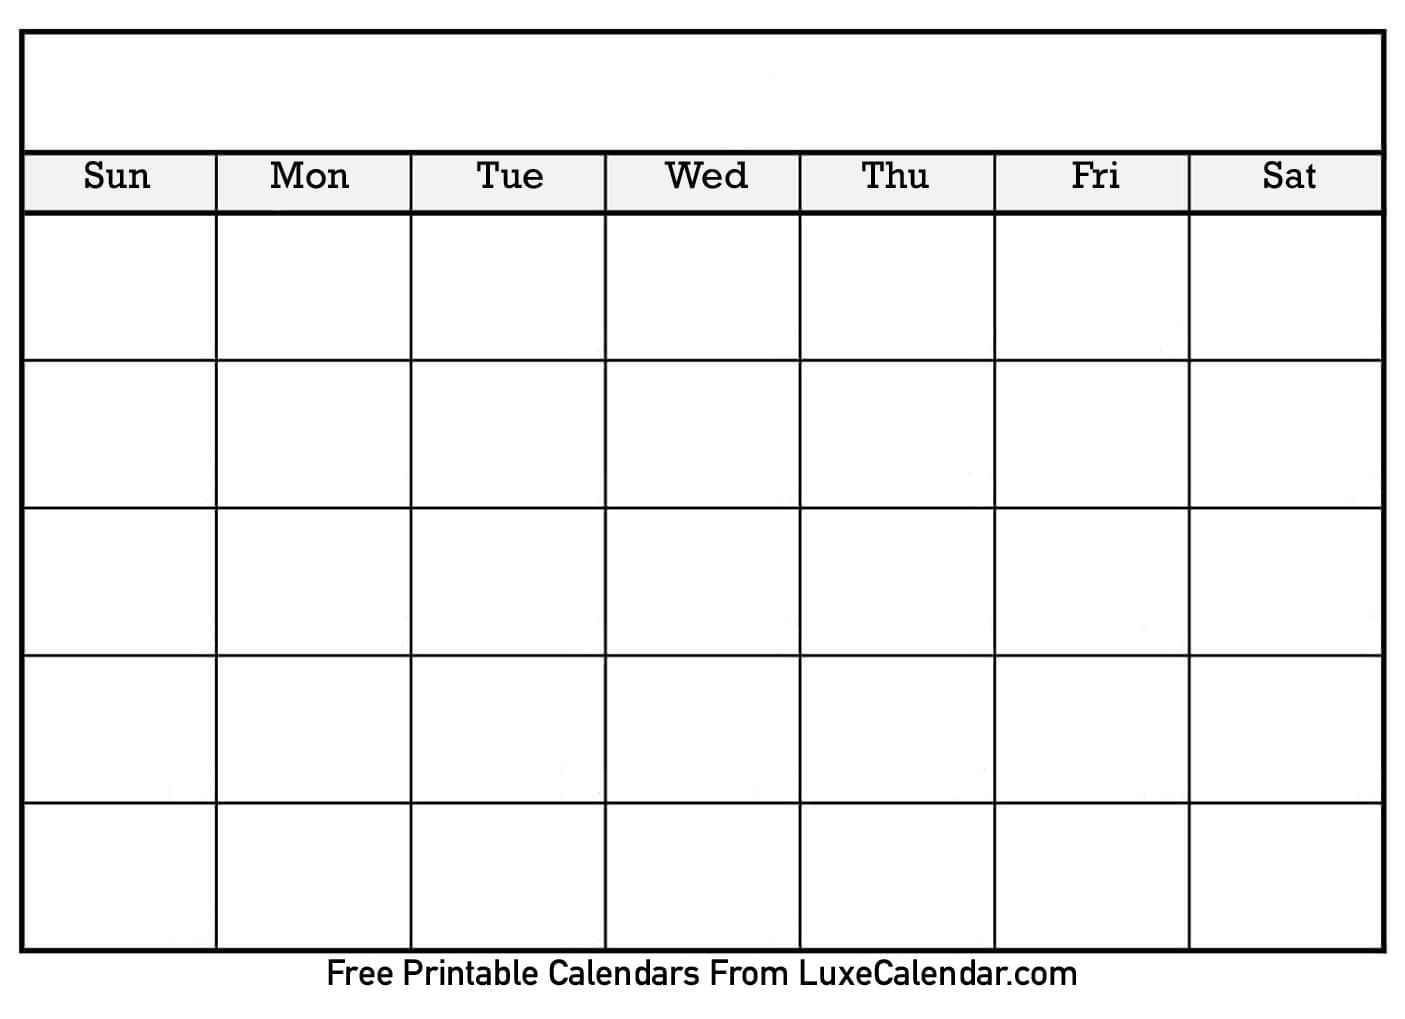 Blank Printable Calendar - Luxe Calendar in Printable Blank Monthly Calendar With Lines